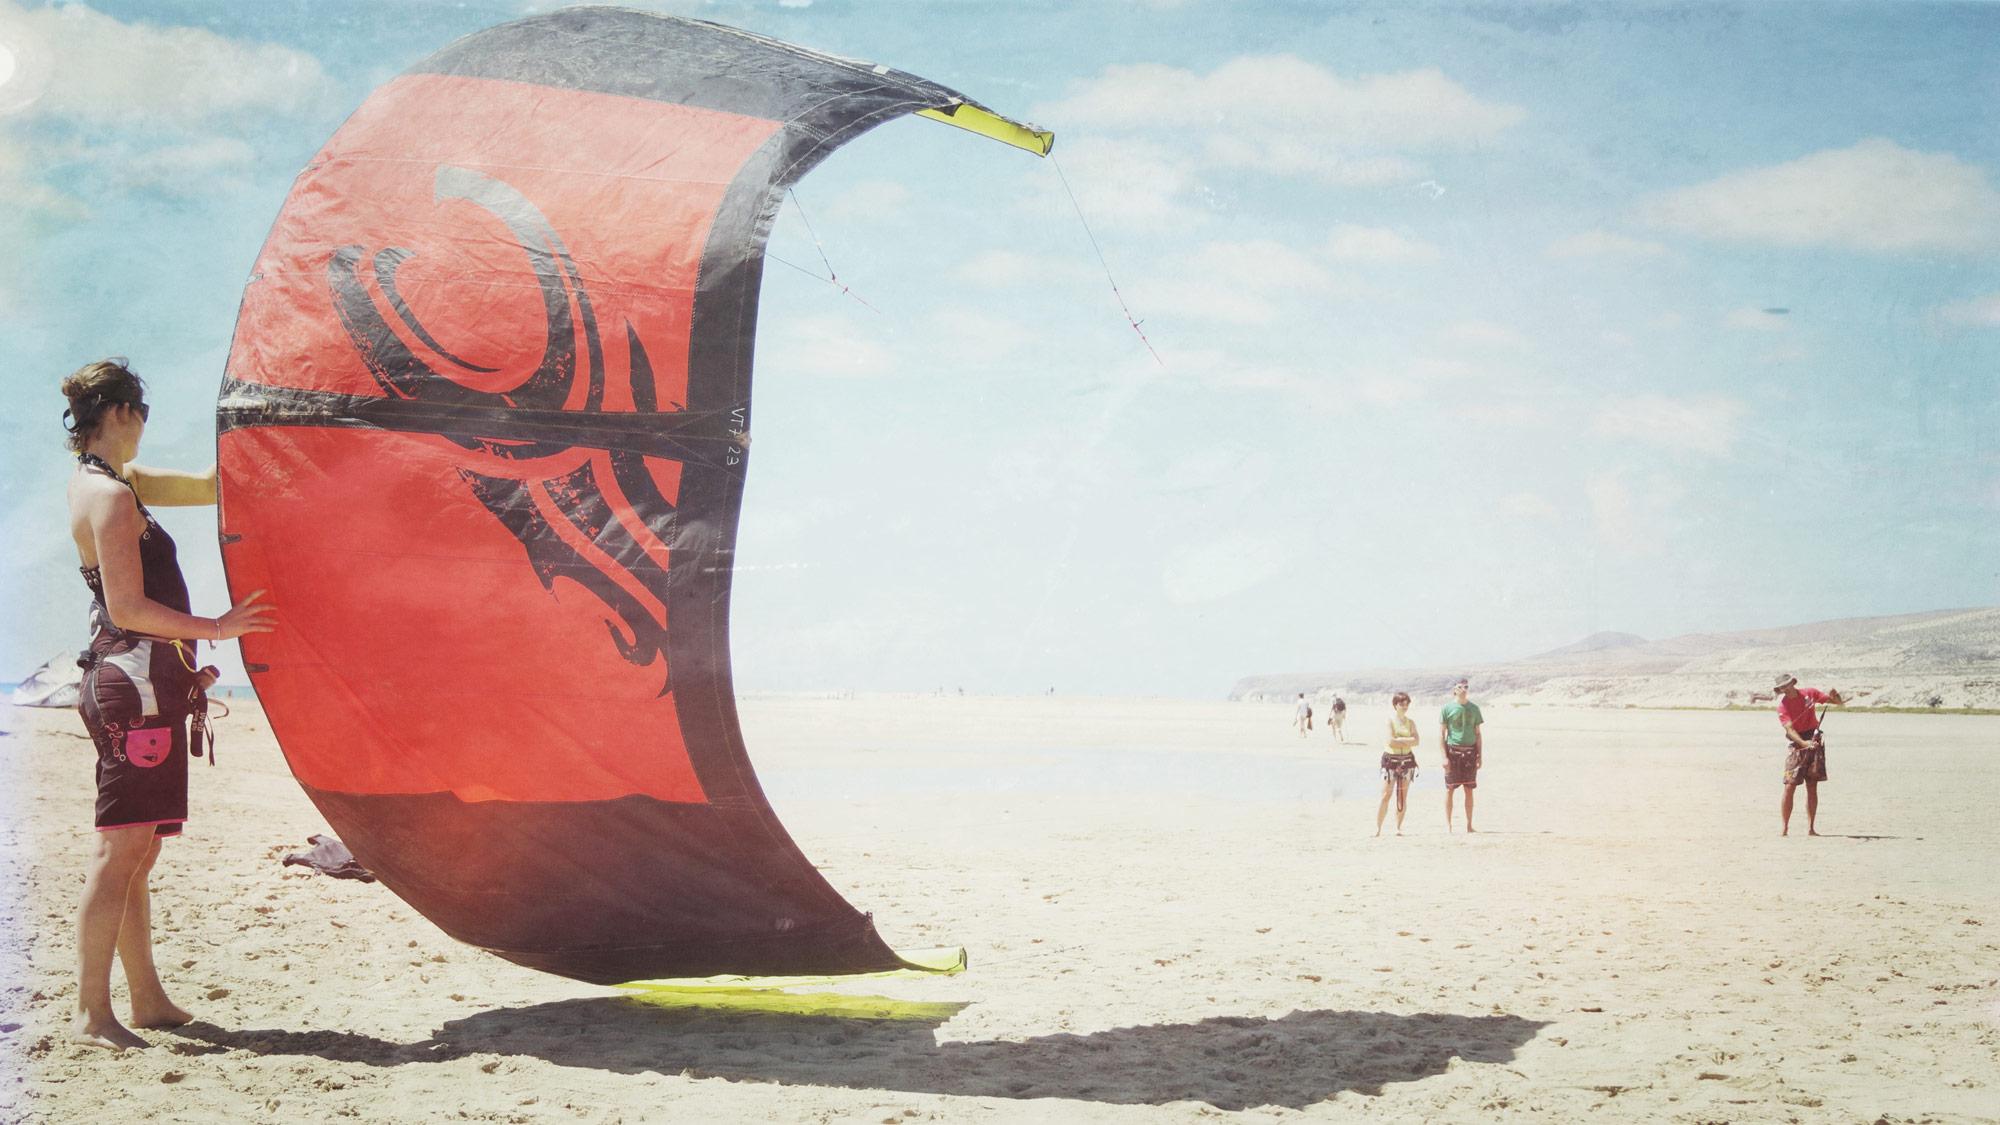 kite-1